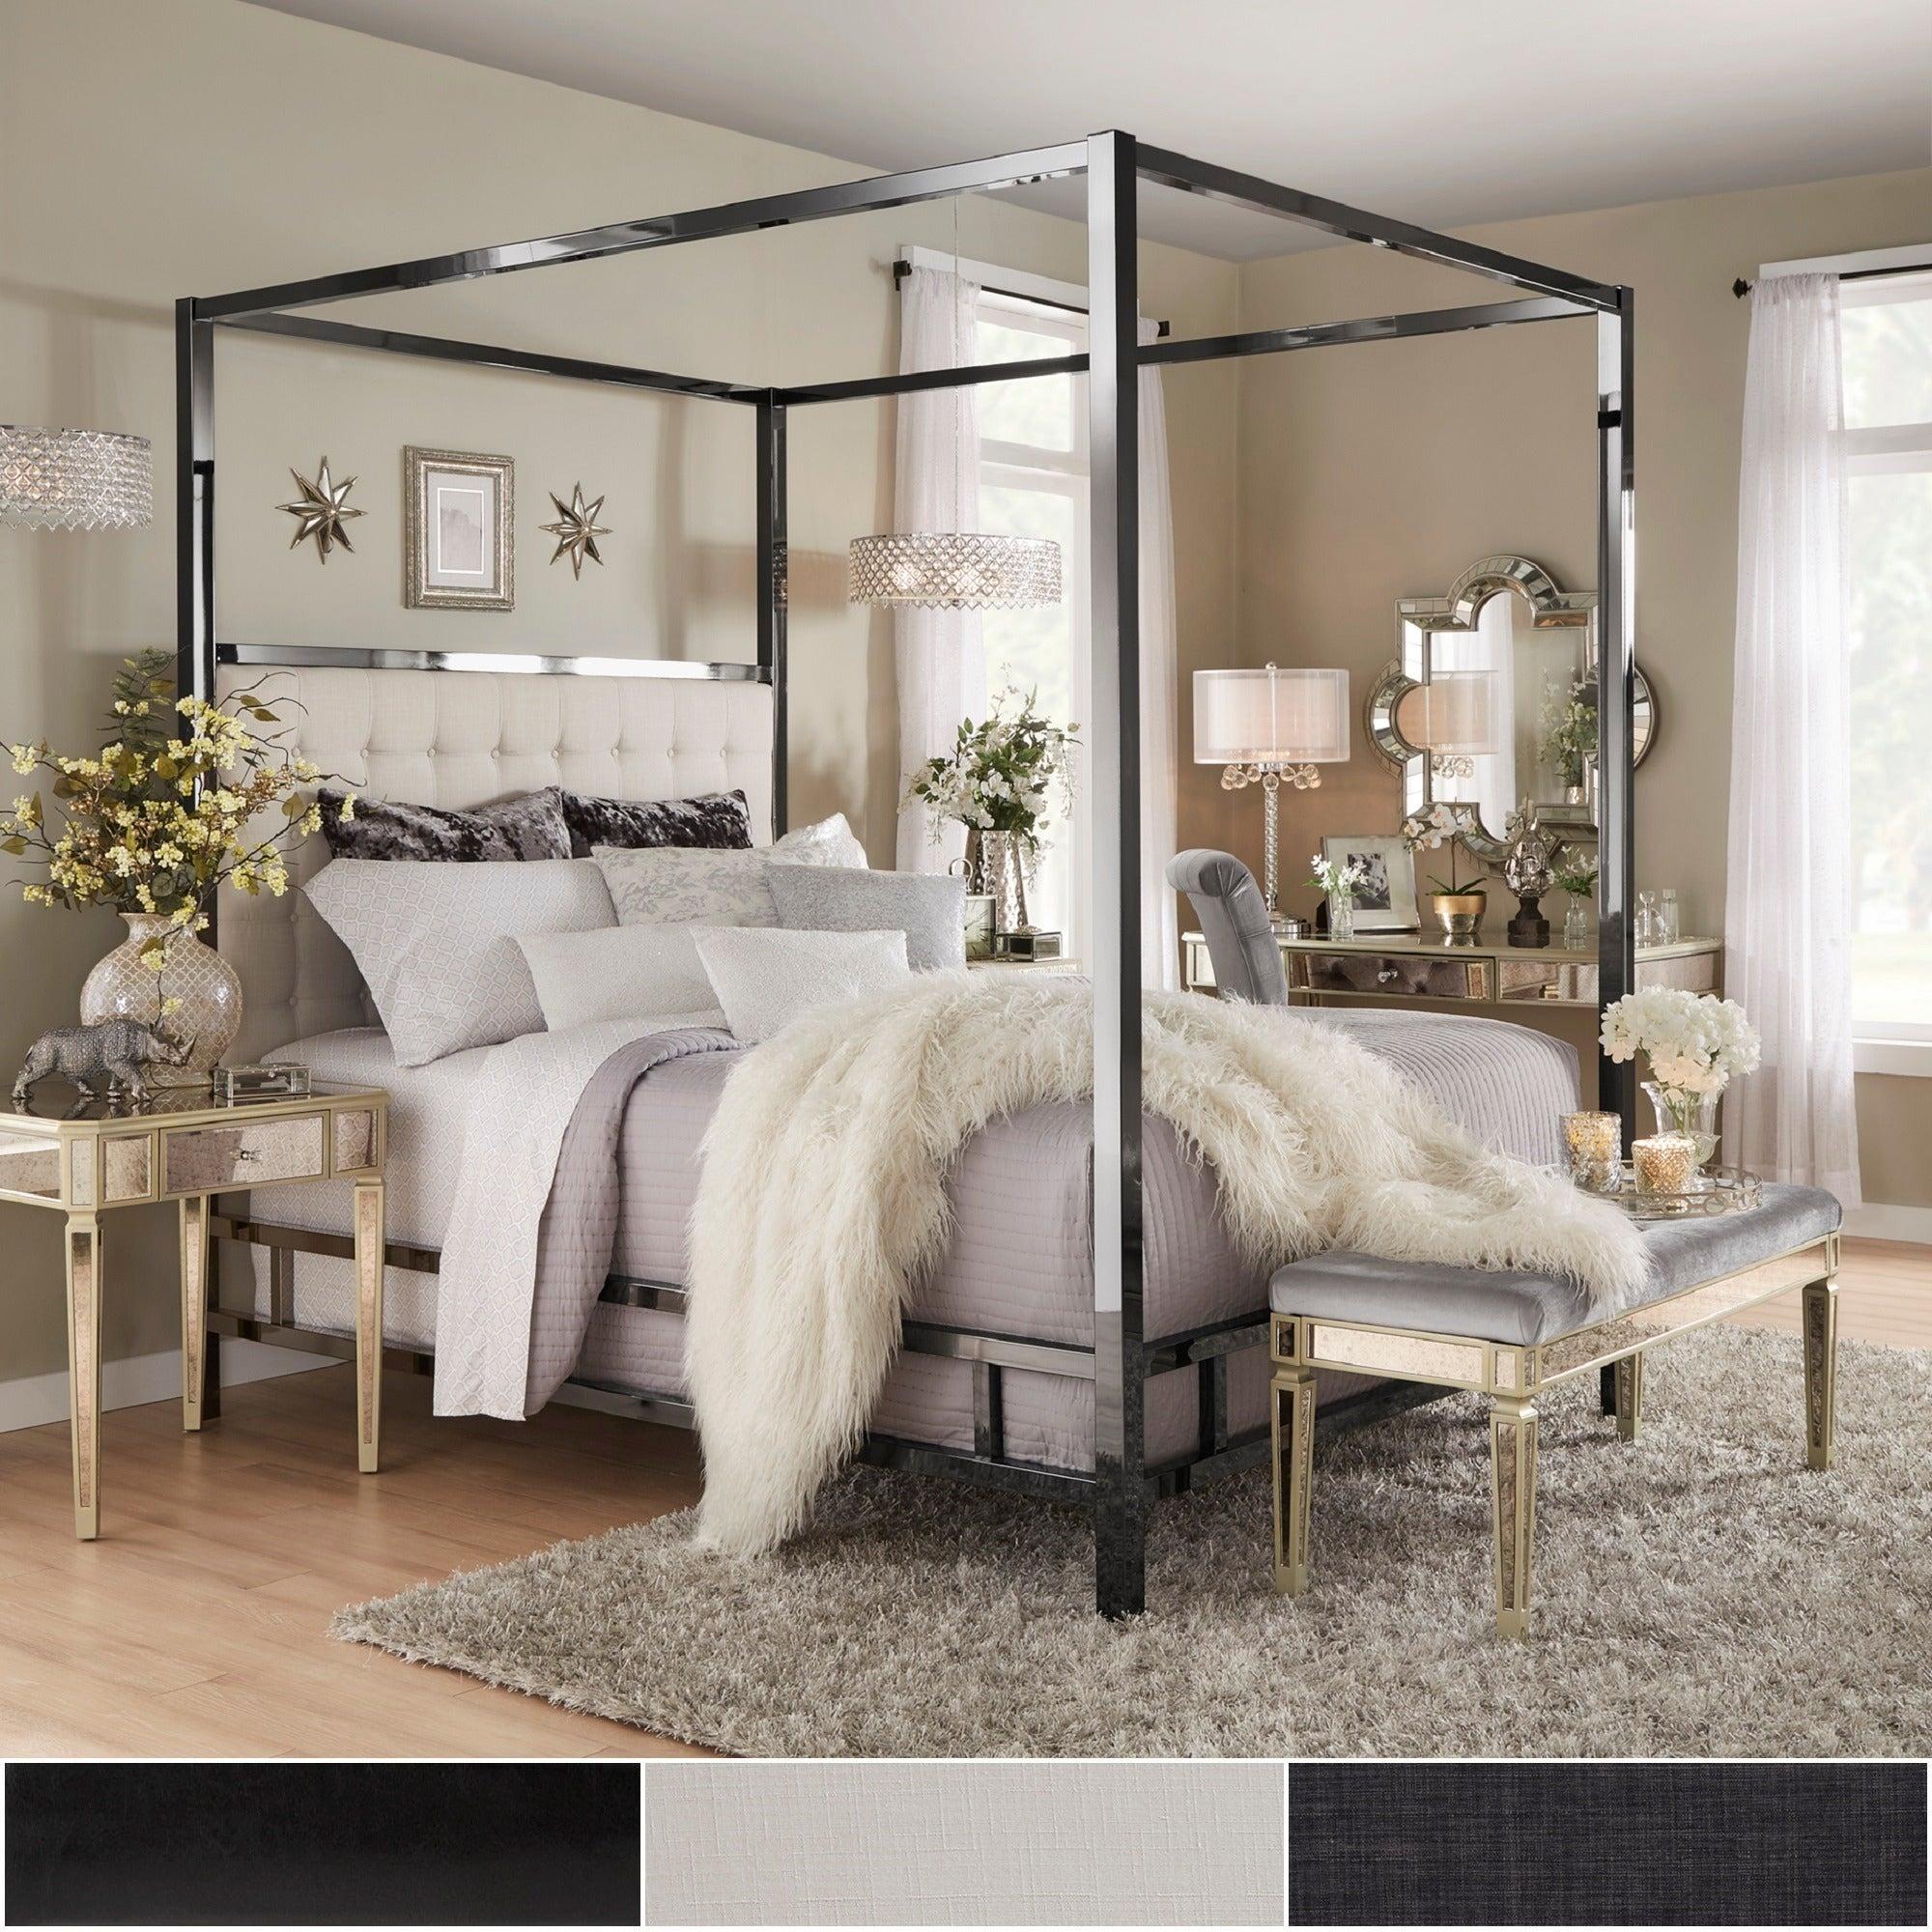 Shop Solivita Black Nickel Metal Queen Size Canopy Poster Bed By